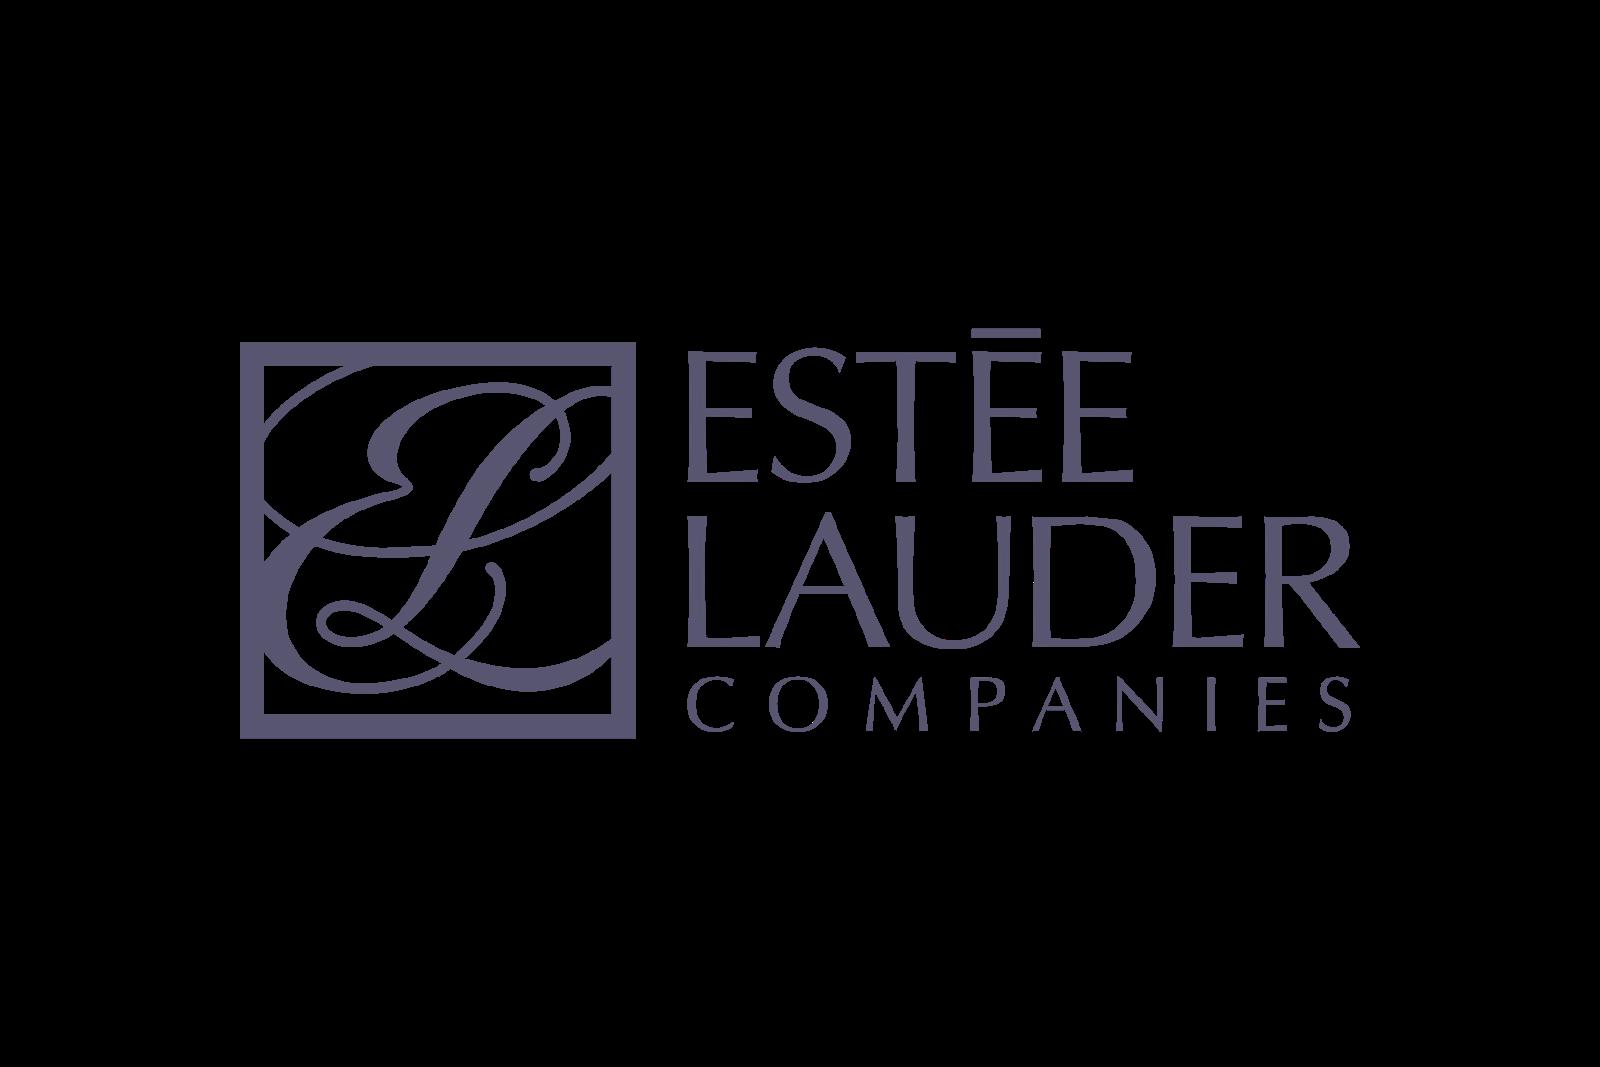 Estee-Lauder logo « Logos of brands | Monograma